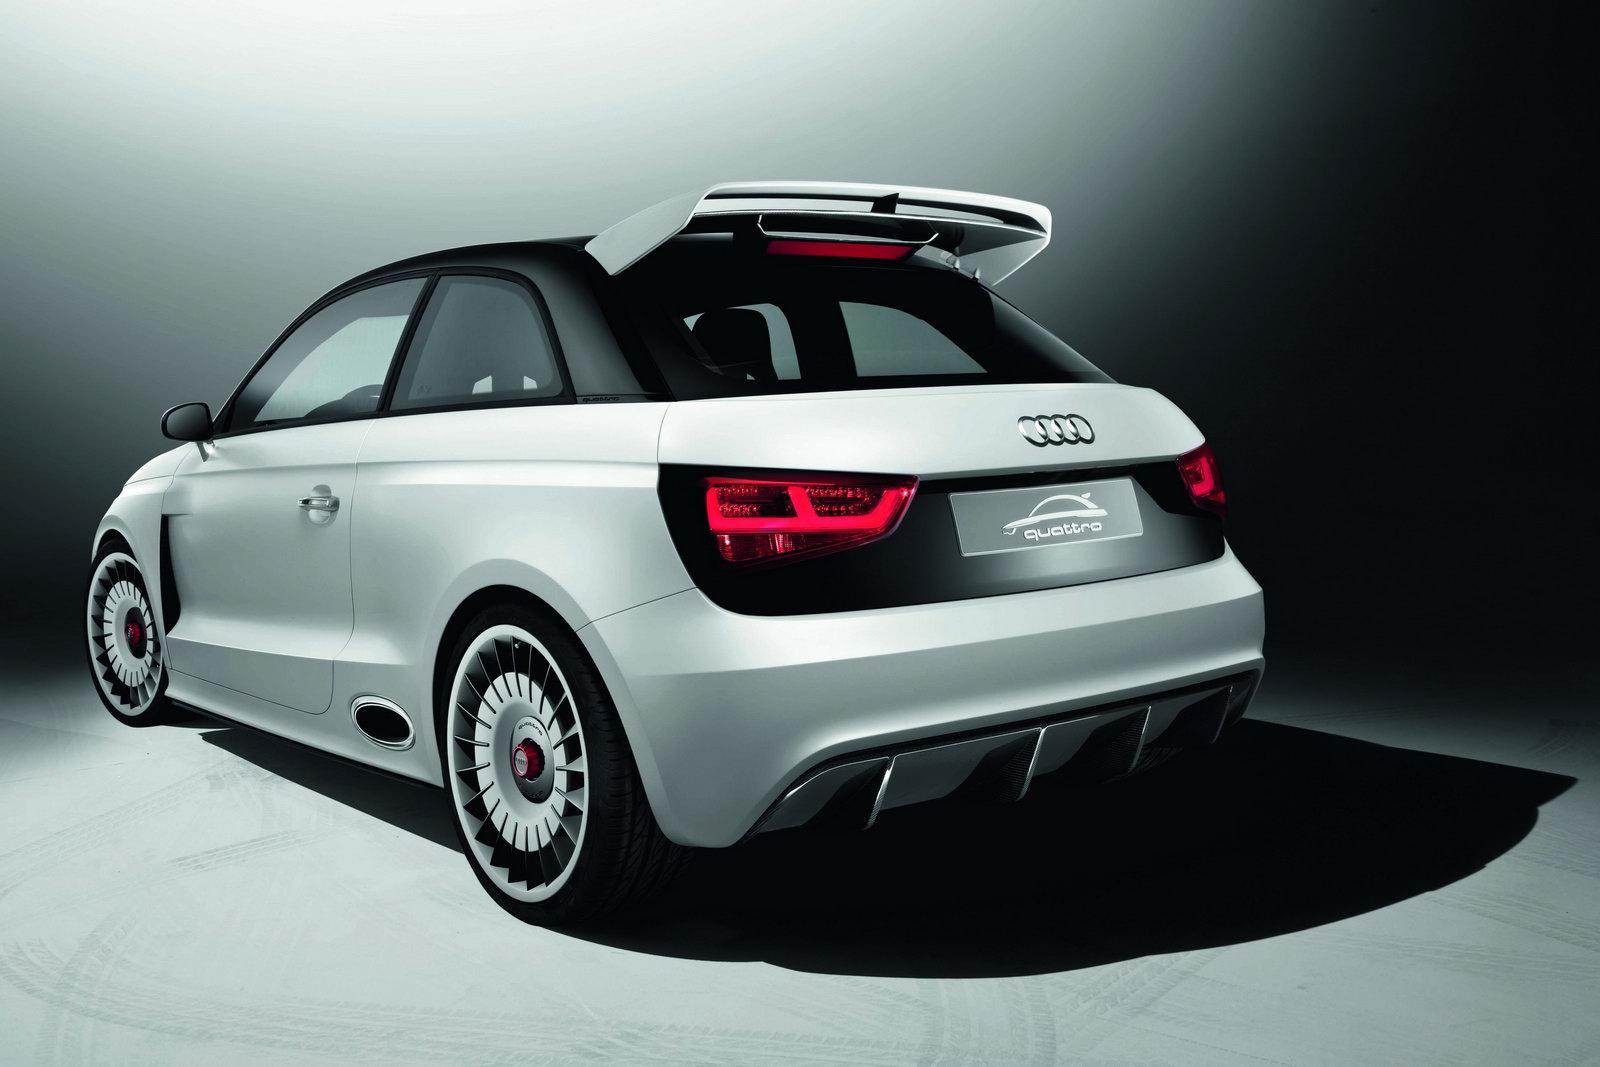 Audi A1 Clubsport Quattro An R8 Fighting Supermini